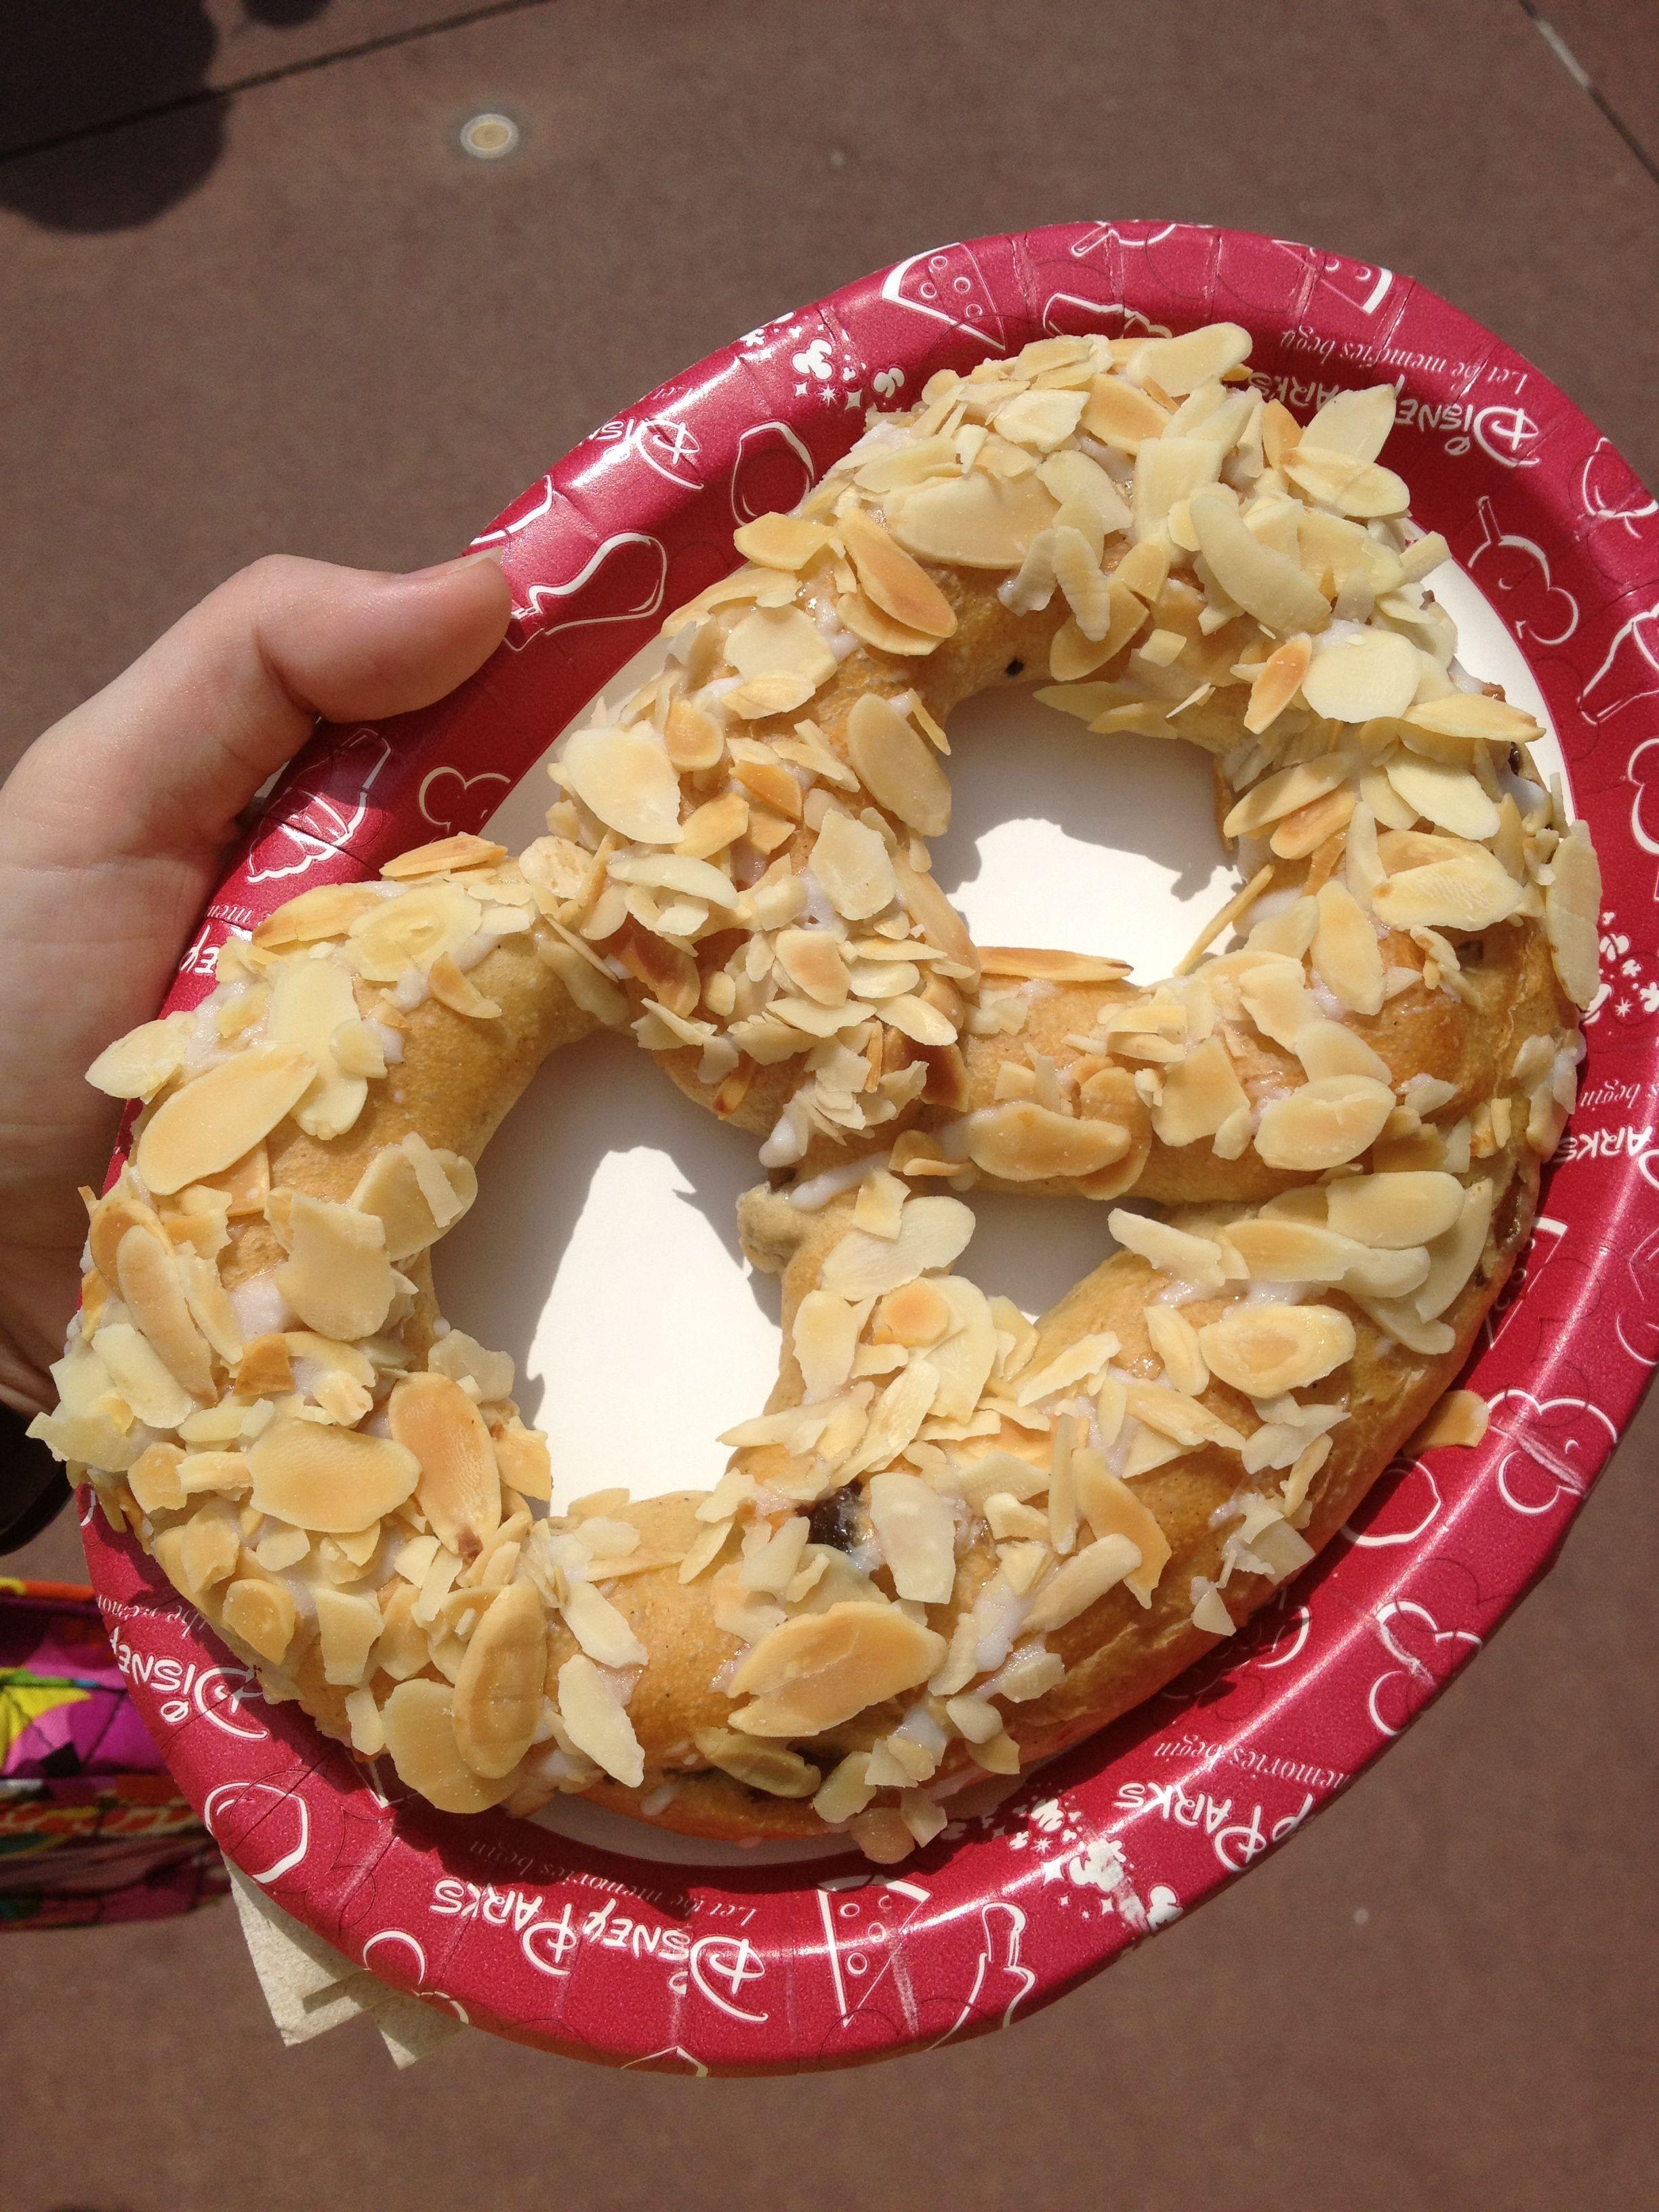 Sweet Pretzel with almonds from Norway. | Walt Disney World ...